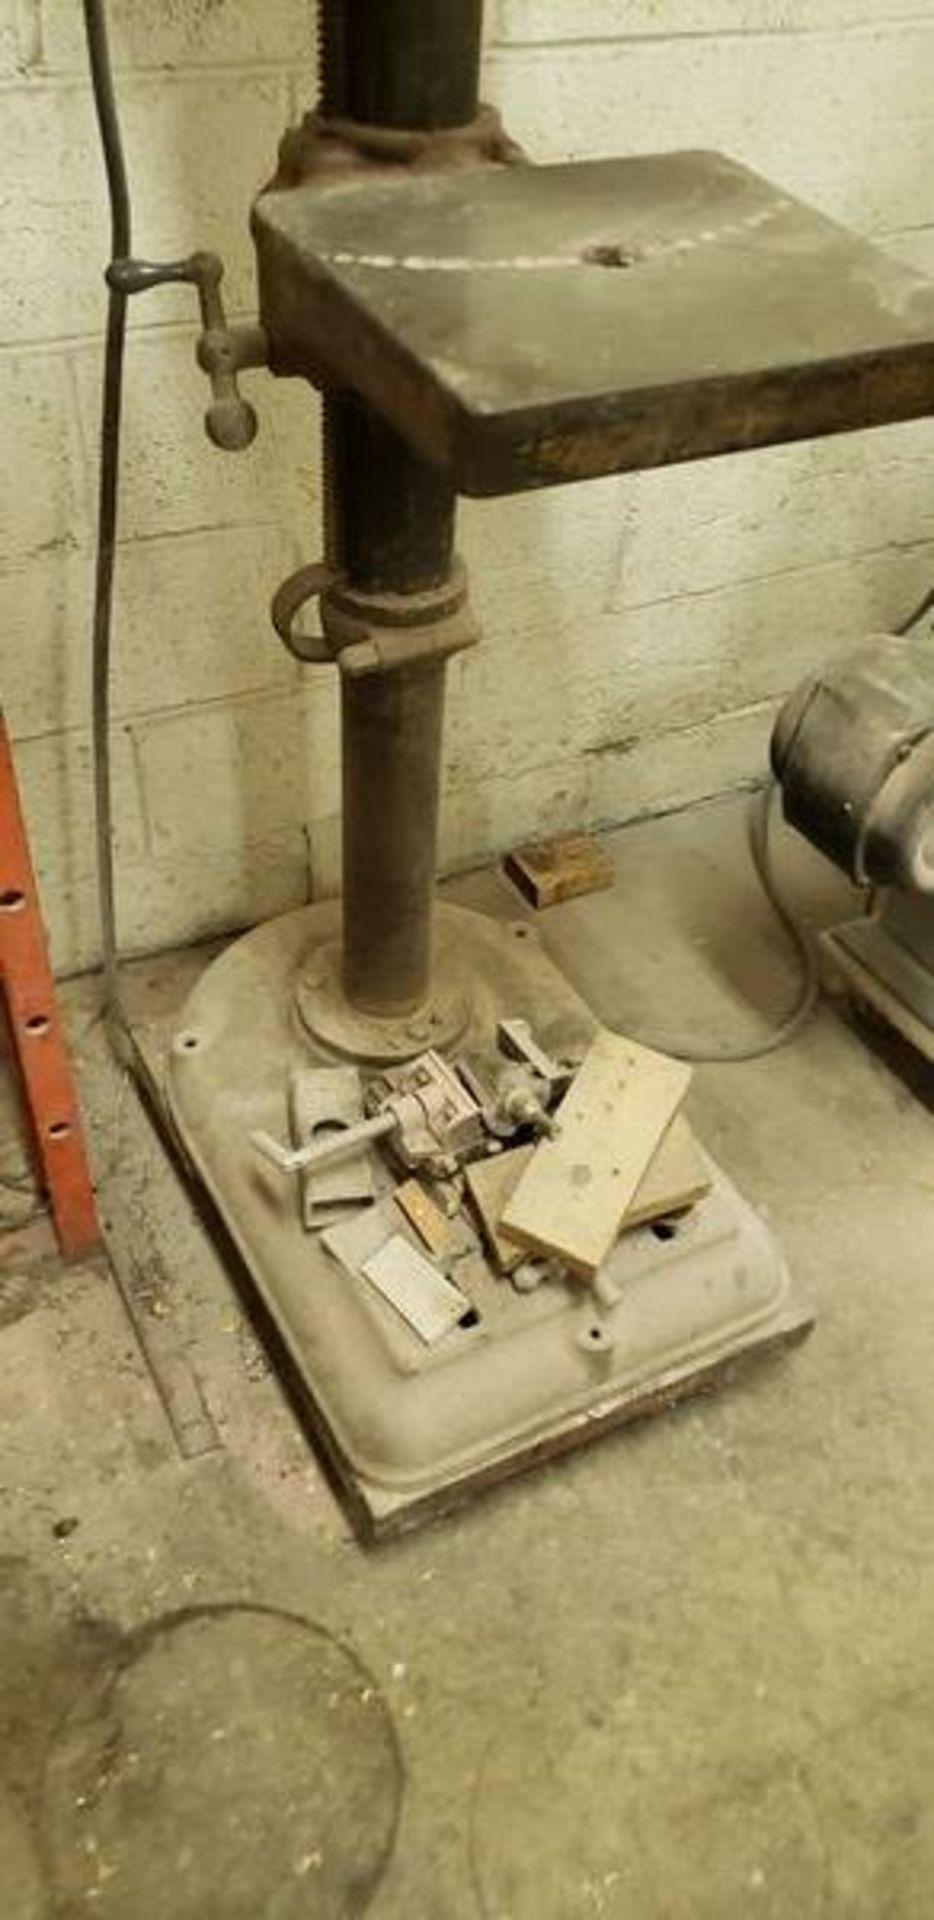 ROCKWELL DELTA 65-1931 MULTI SPEED DRILL PRESS - Image 5 of 5